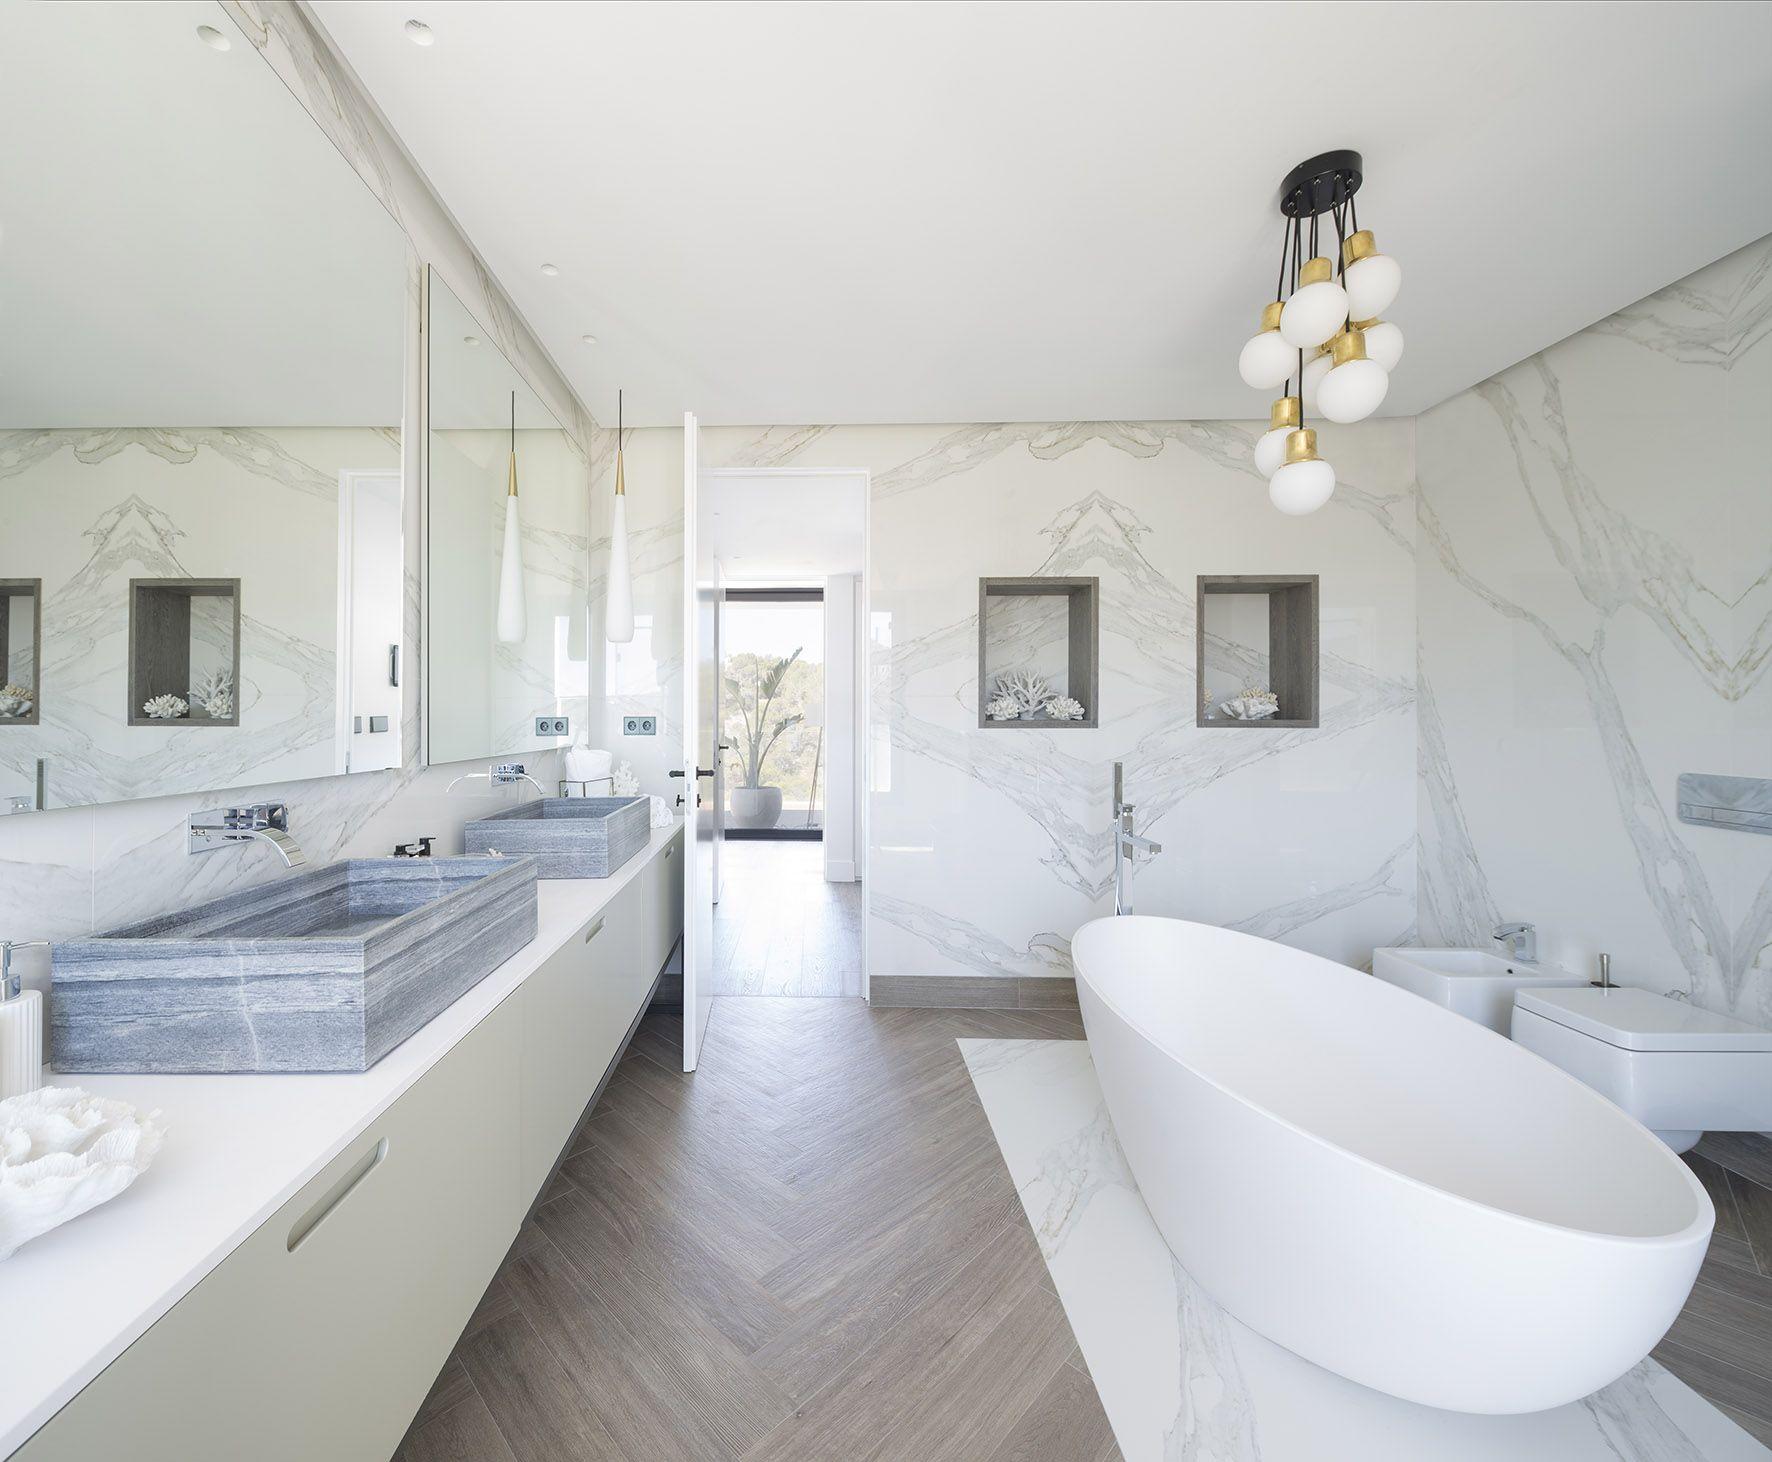 Ba o de vivienda en ibiza dise ado por natalia for Encimera marmol gris